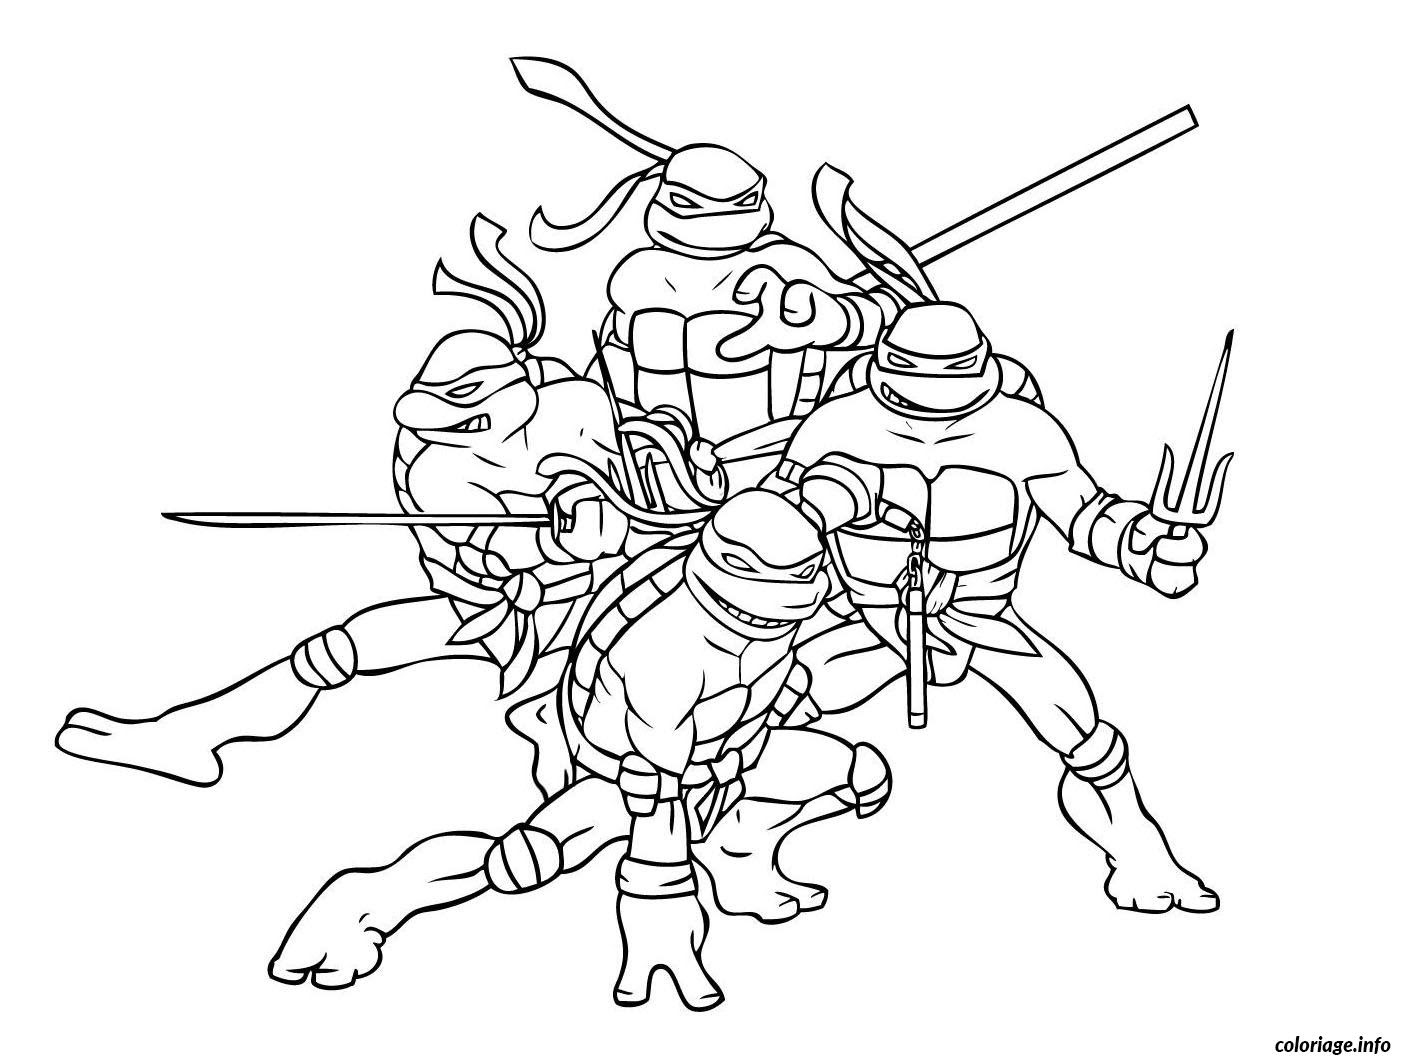 Coloriage Tortue Ninja 2 Dessin  Imprimer